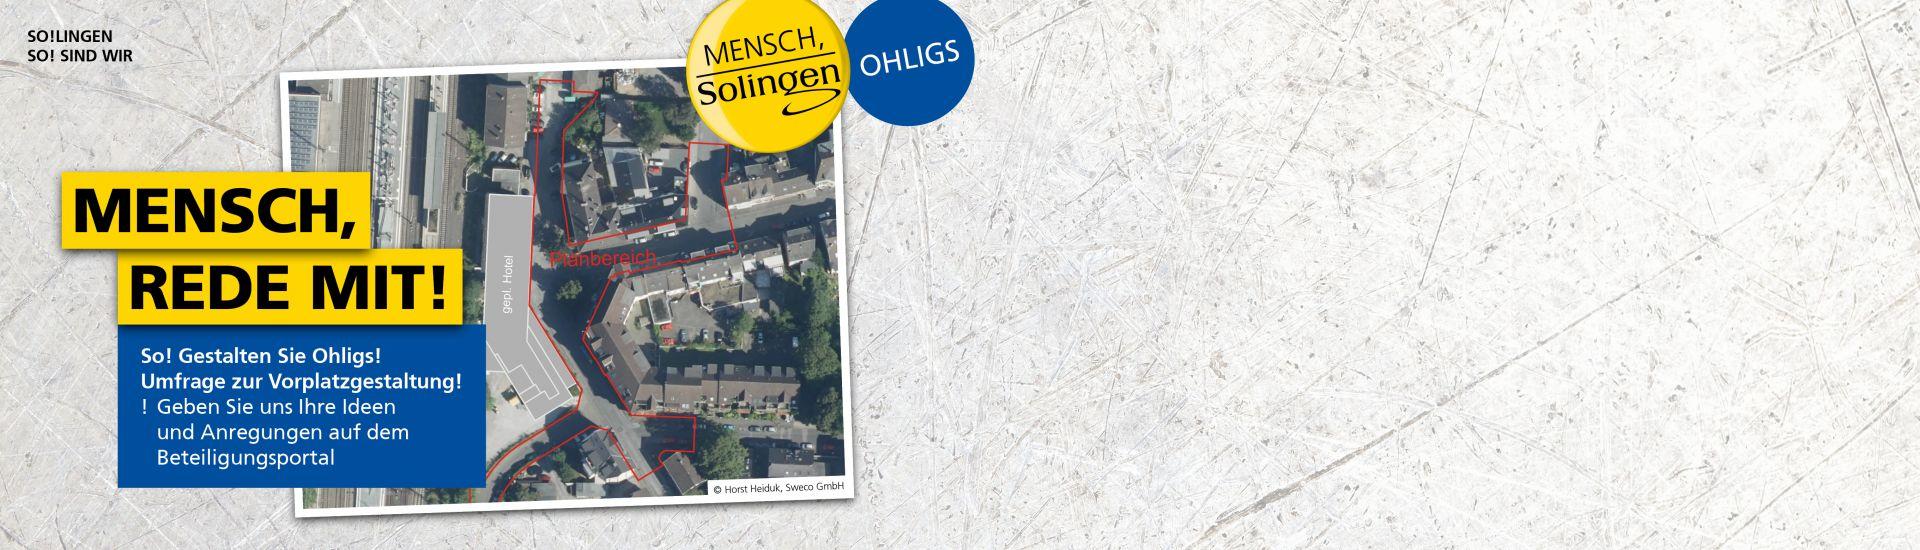 Vorplatz Solingen Ohligs Ost